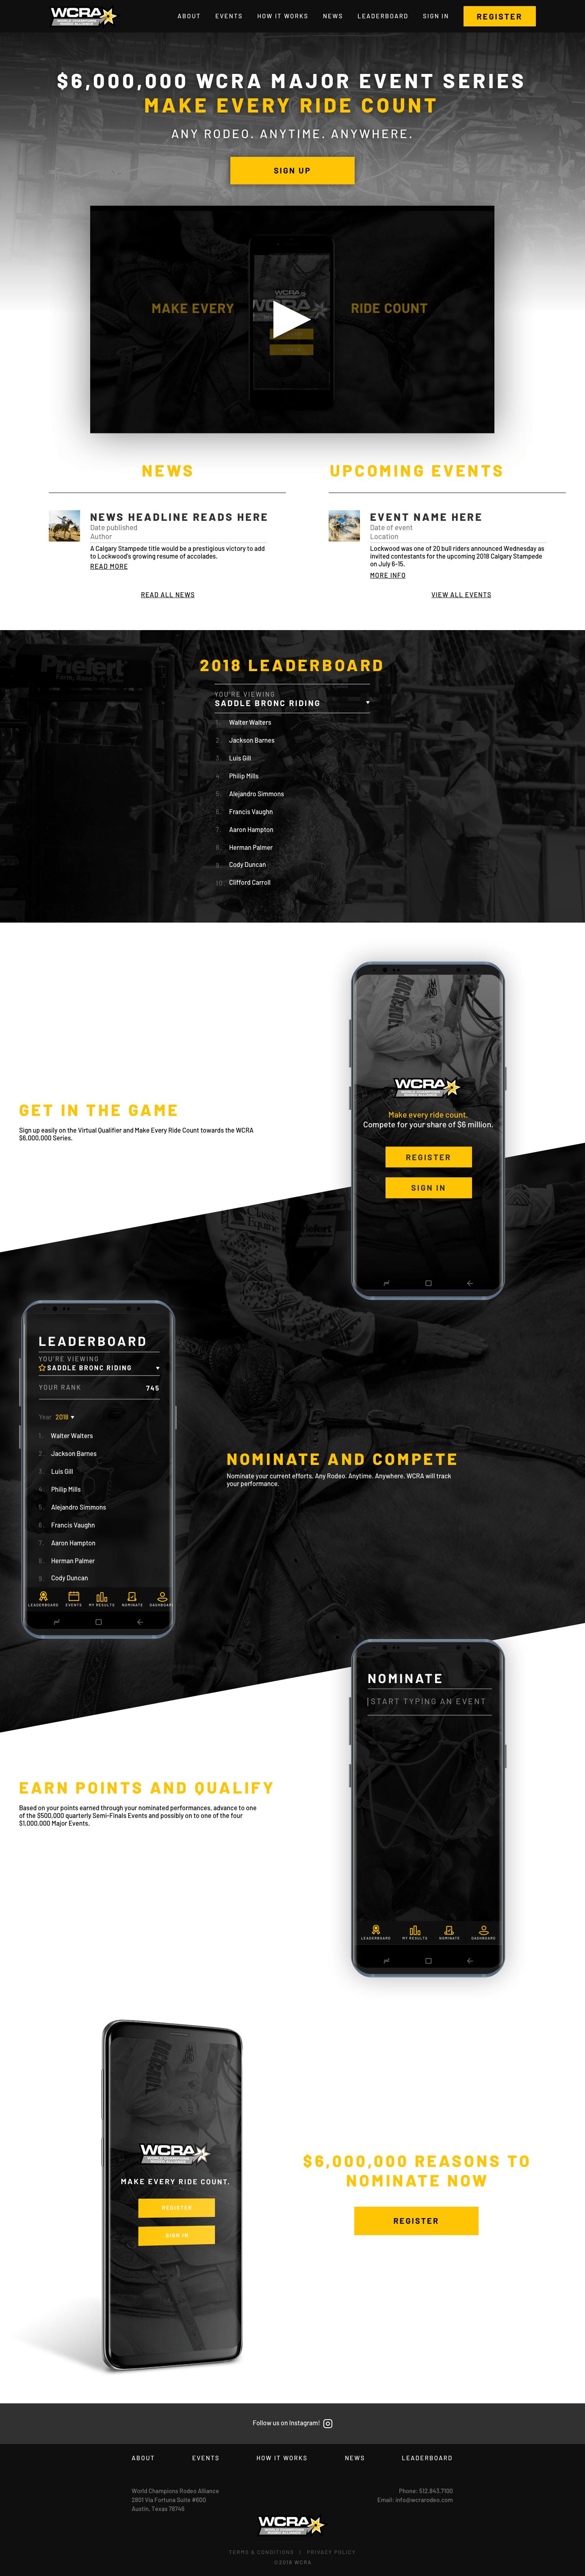 wcra marketing site screen grab